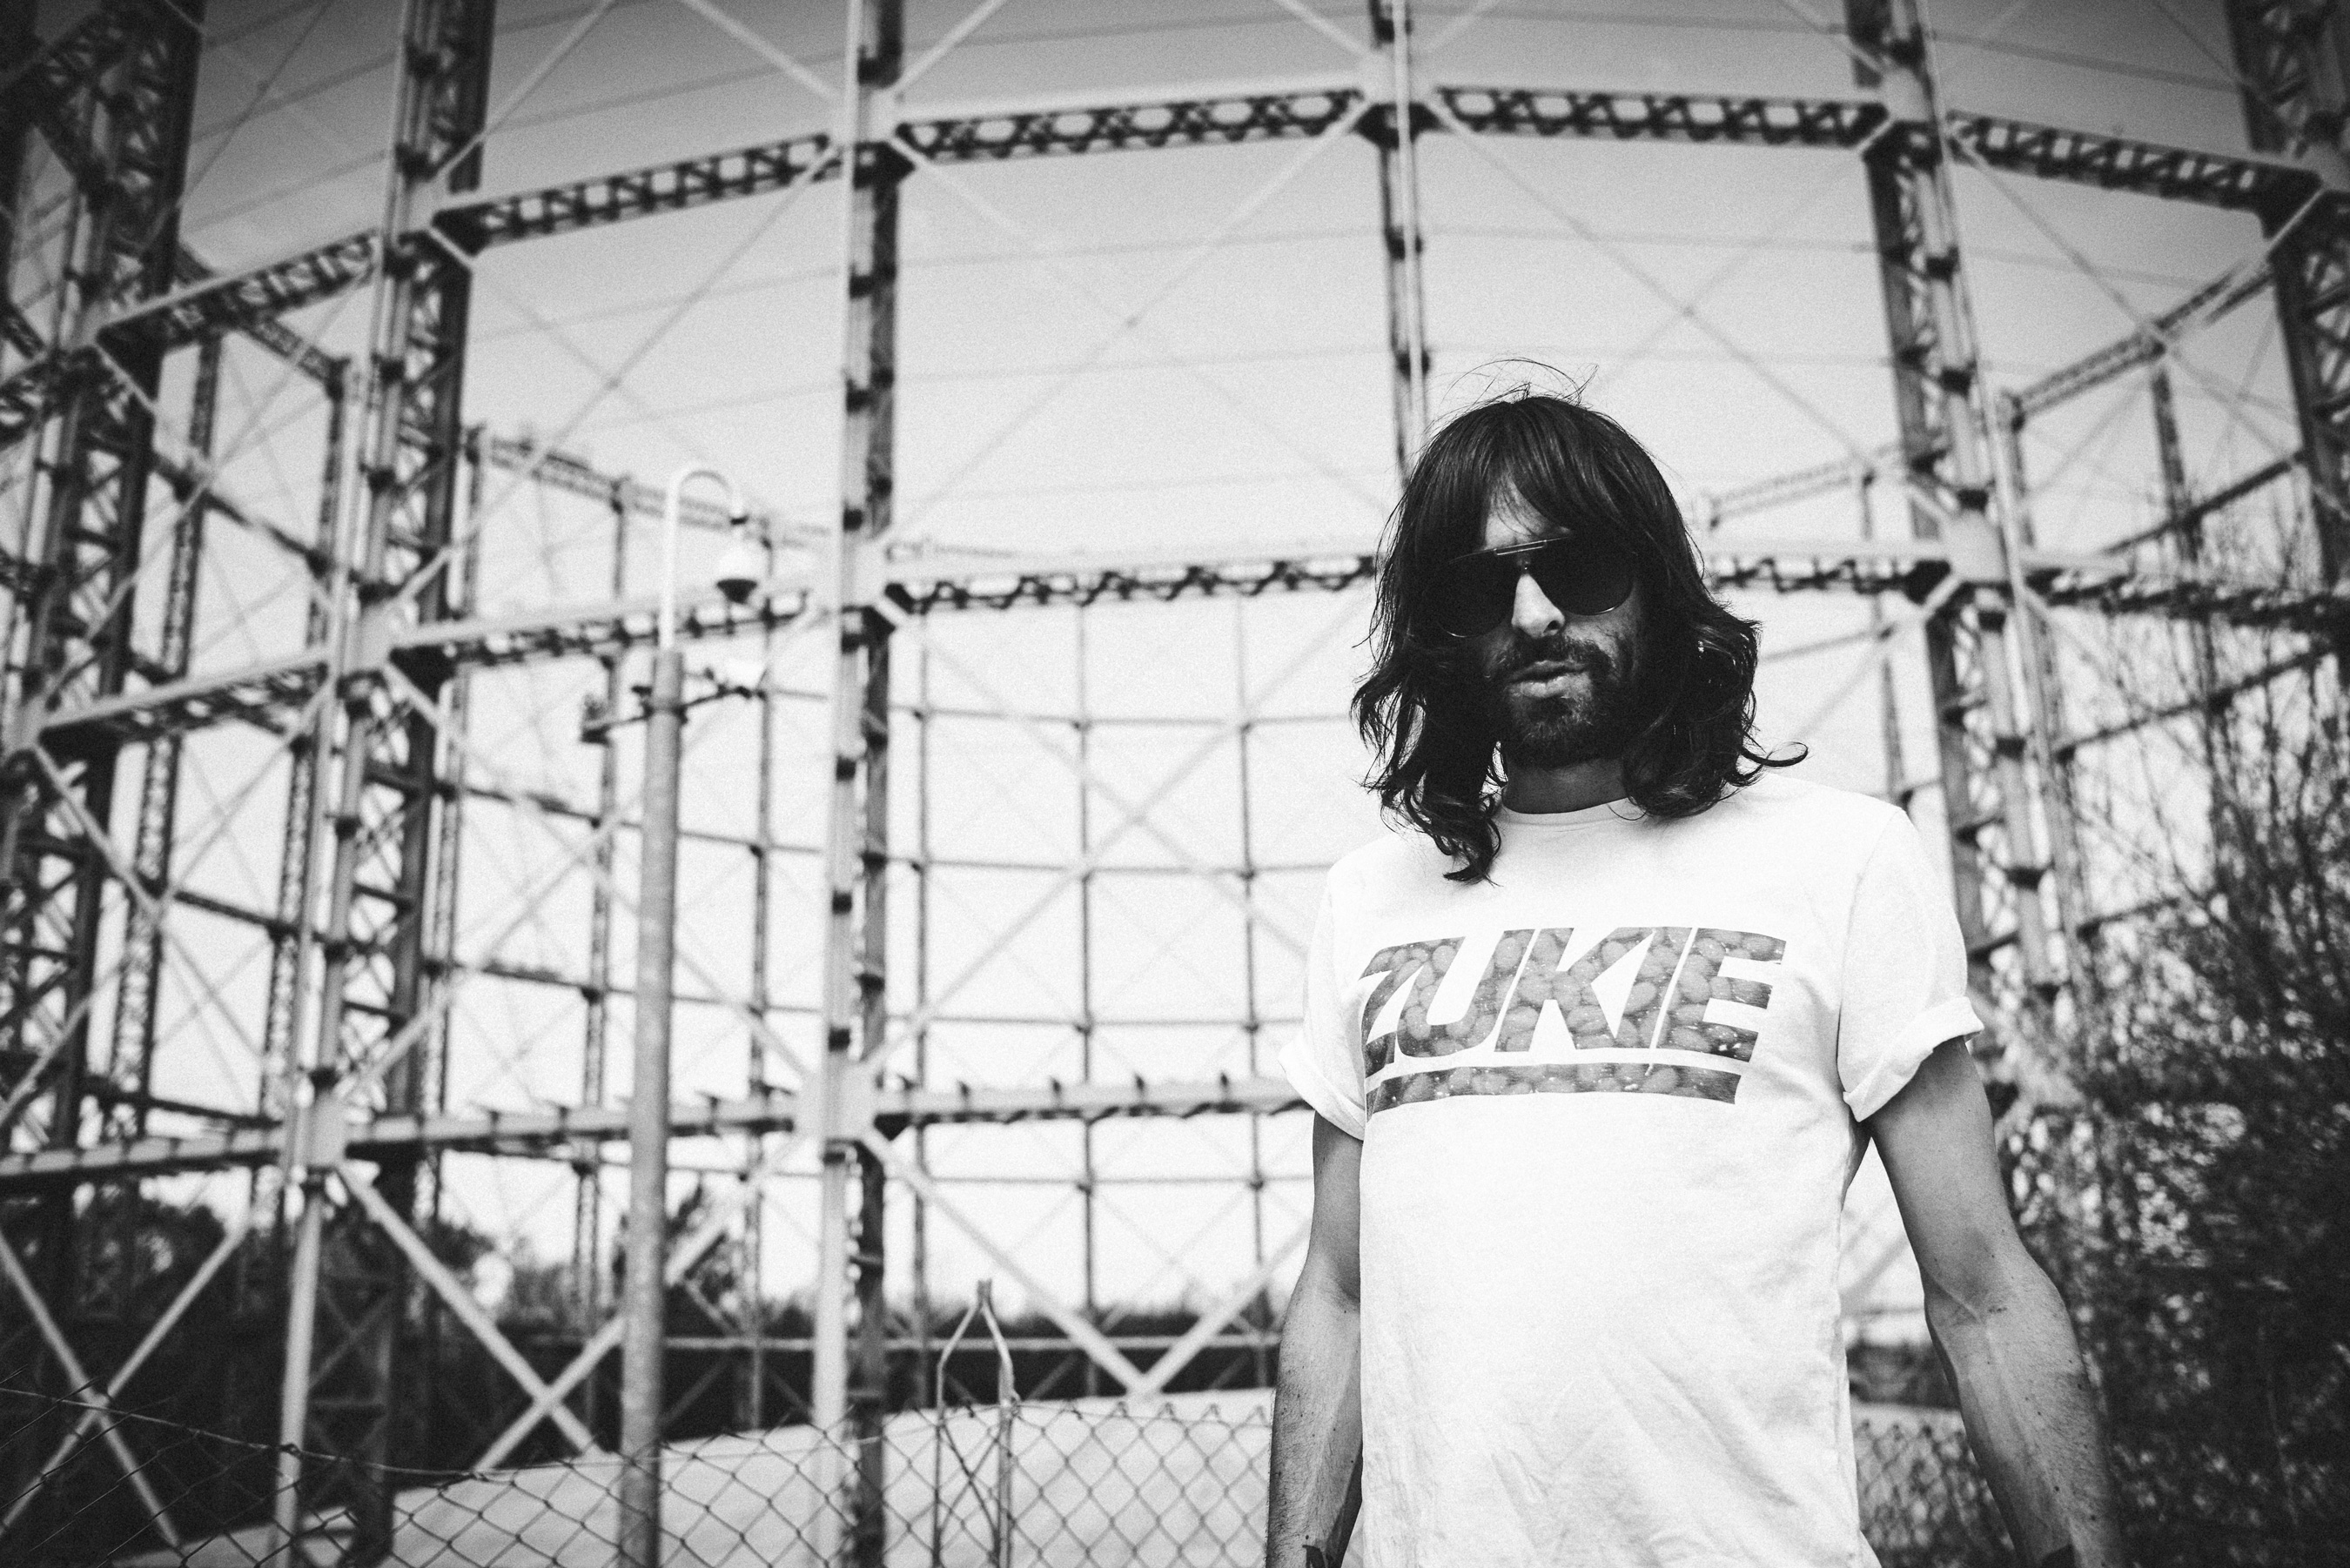 Matt-Stansfield-Photographer-lifestyle-ben-grove-skateboard-331